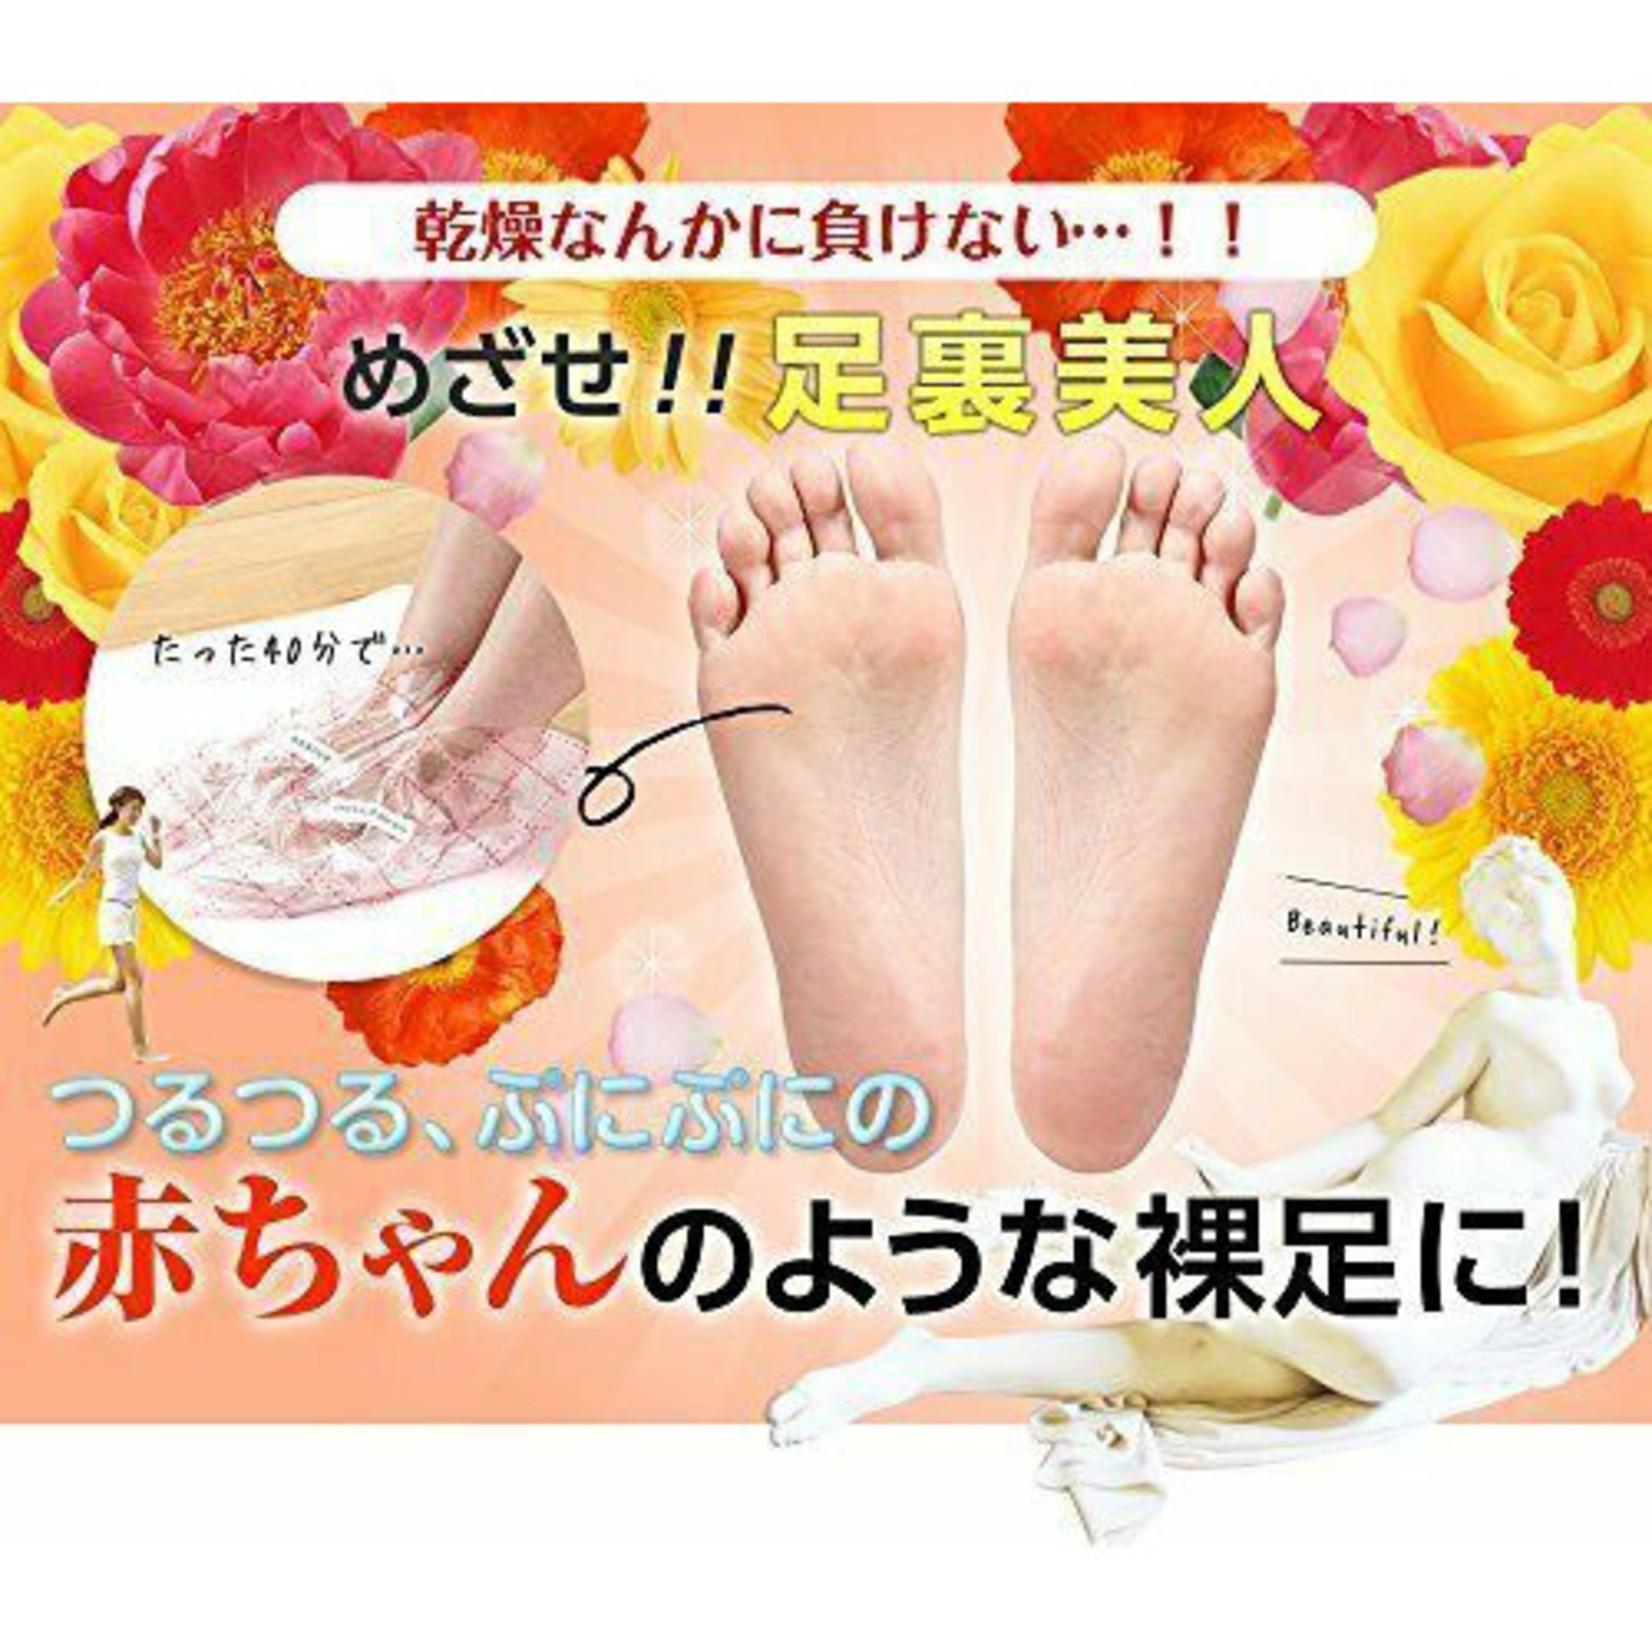 Ashura Horse Oil Foot Peeling Mask